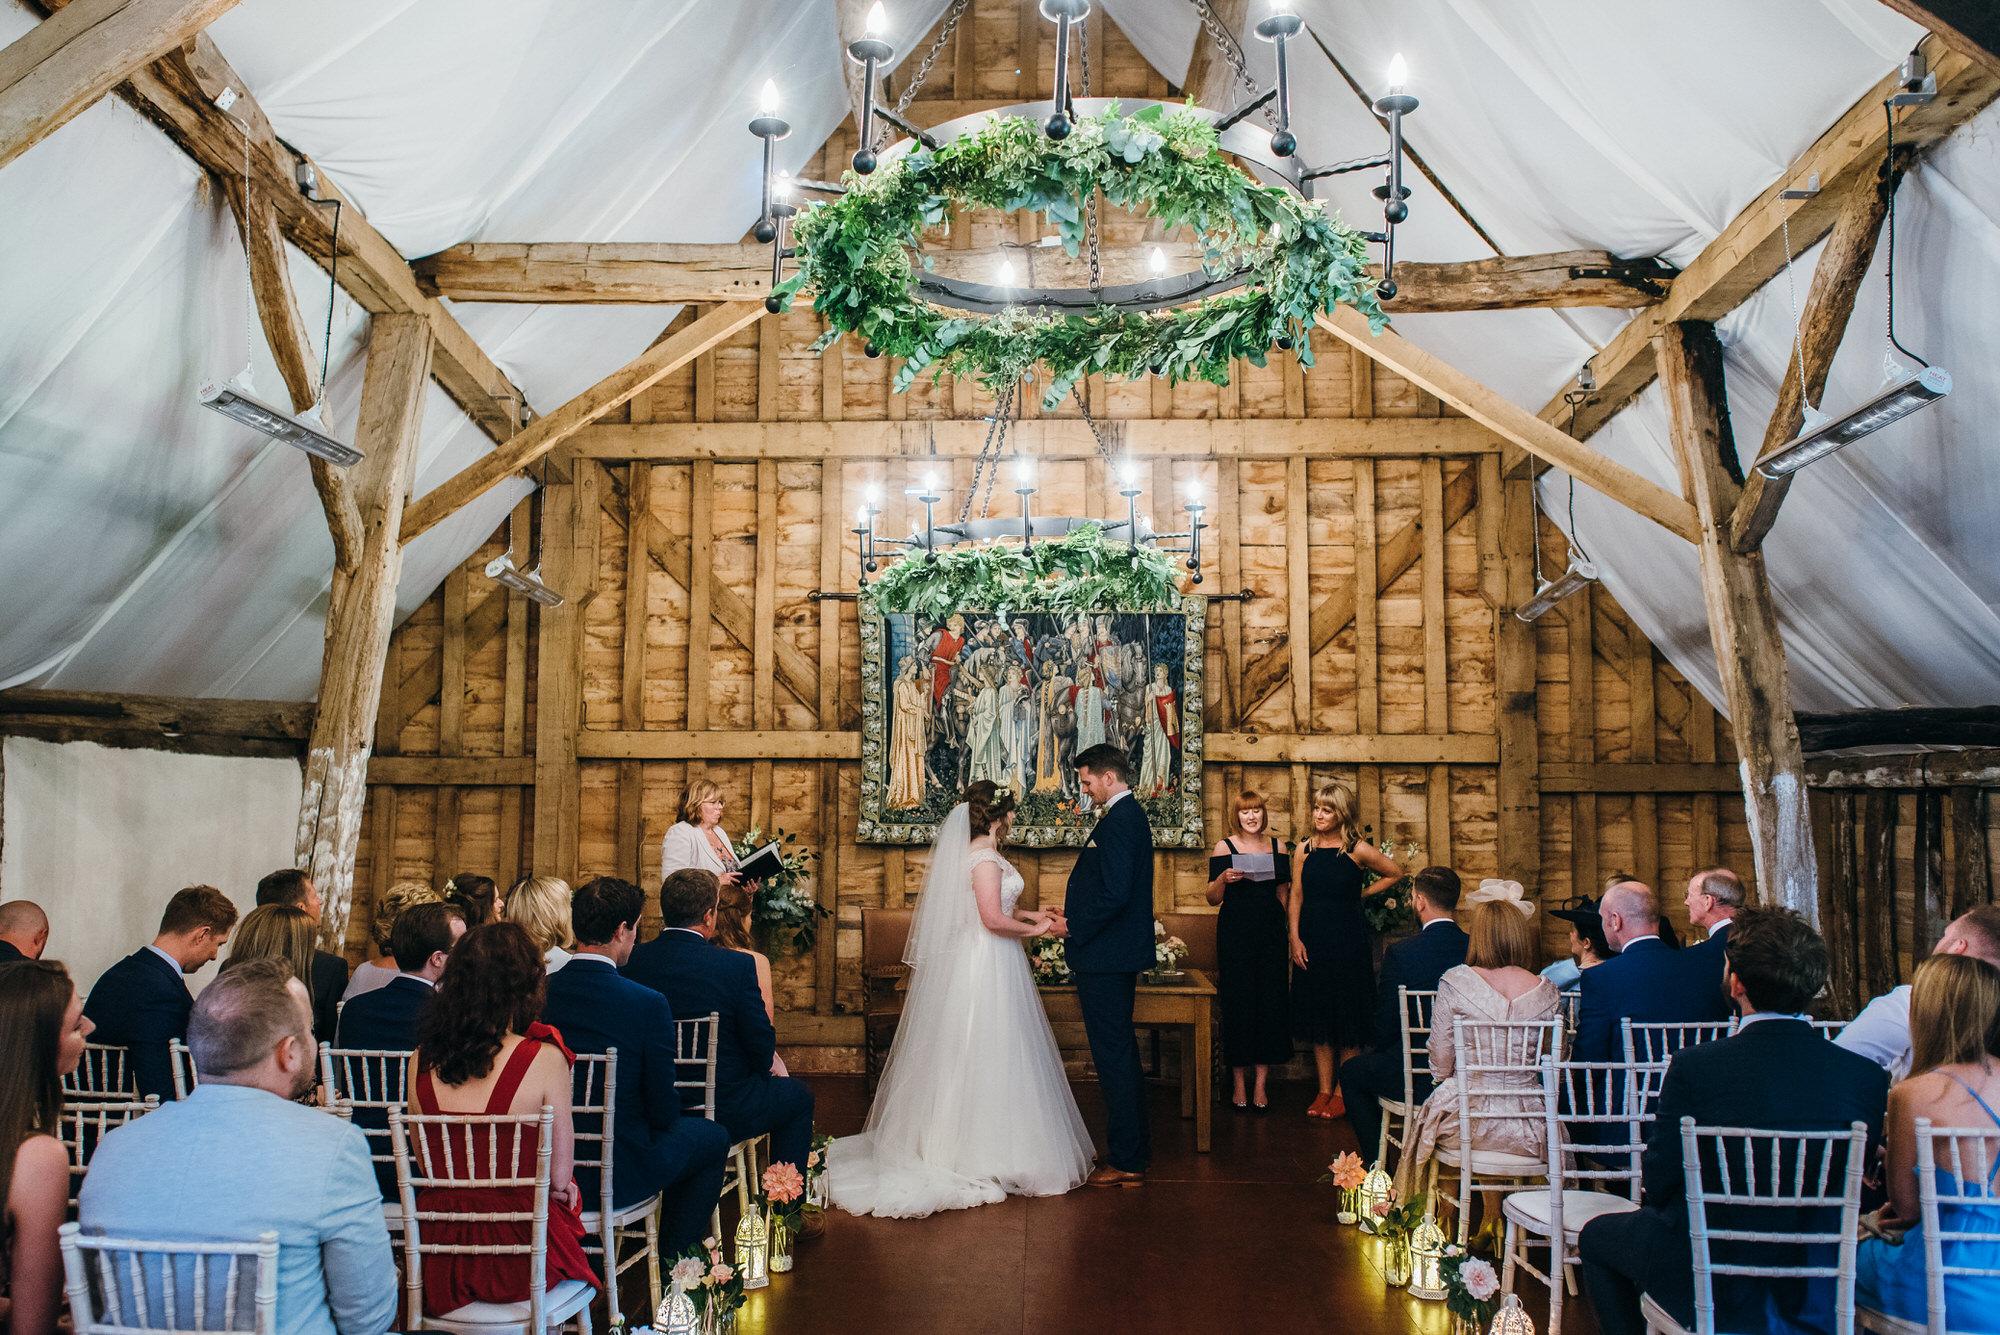 Colville hall wedding barn ceremony